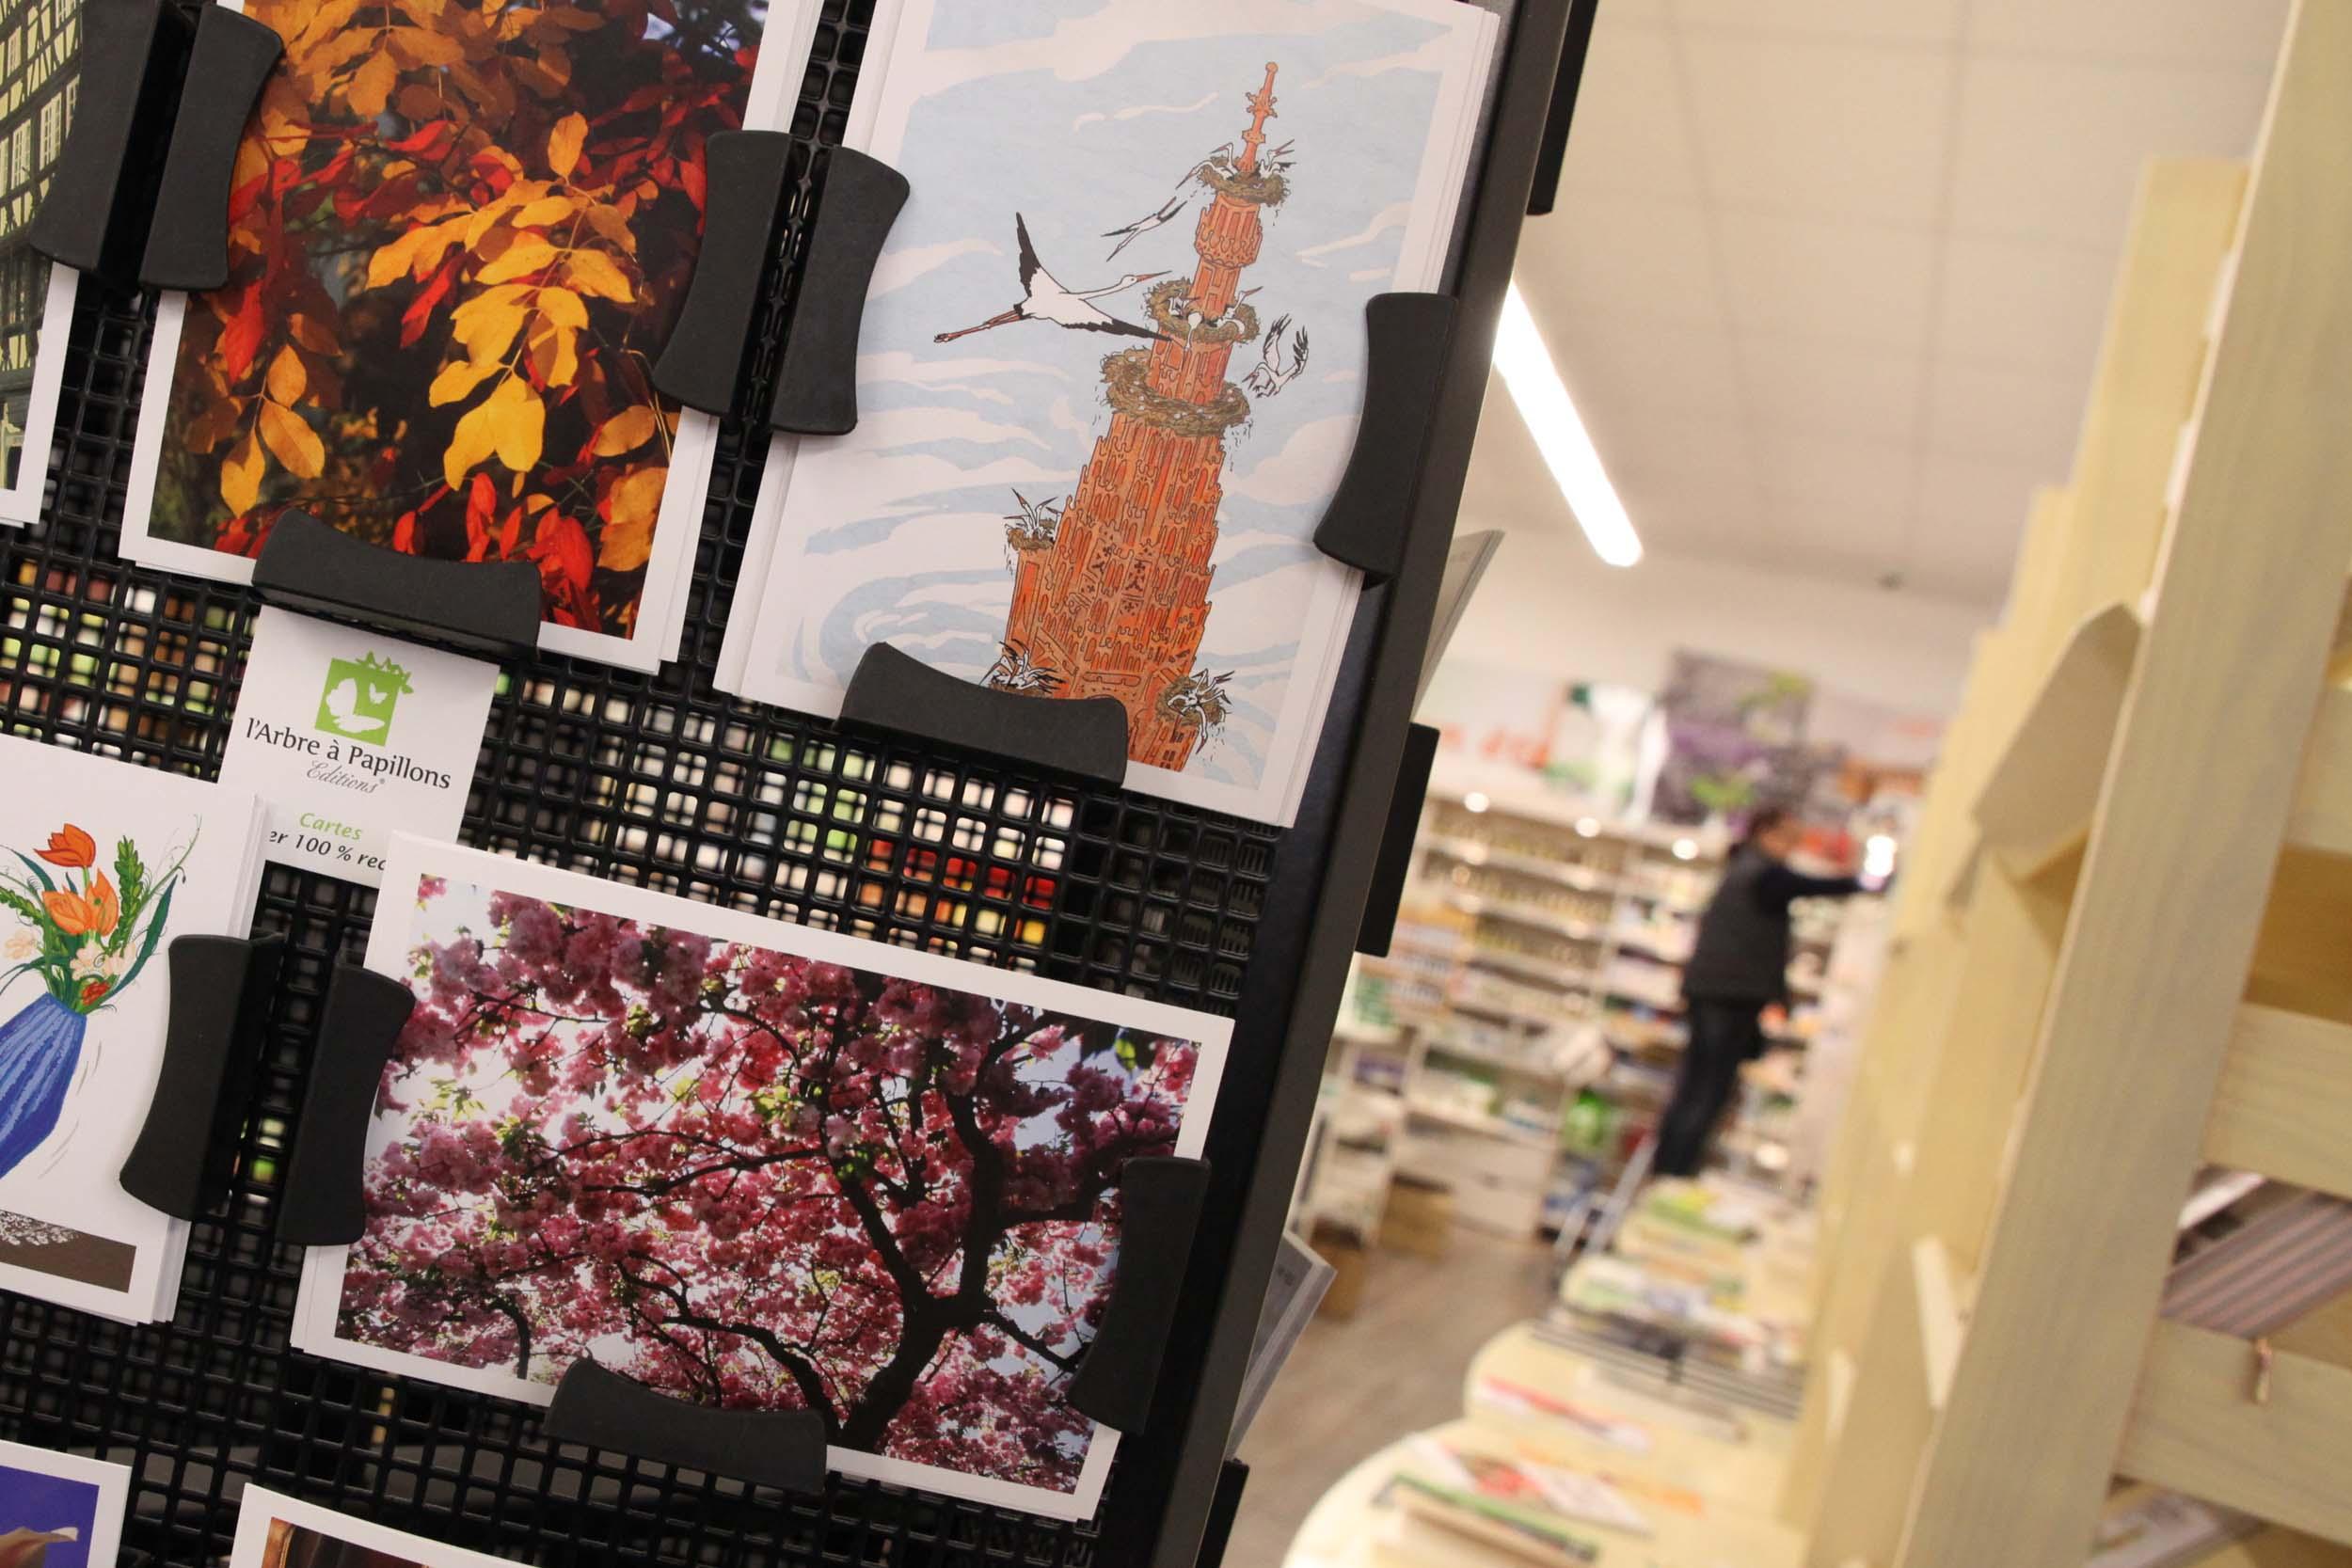 carte postale arbre a papillon illkirch.jpg